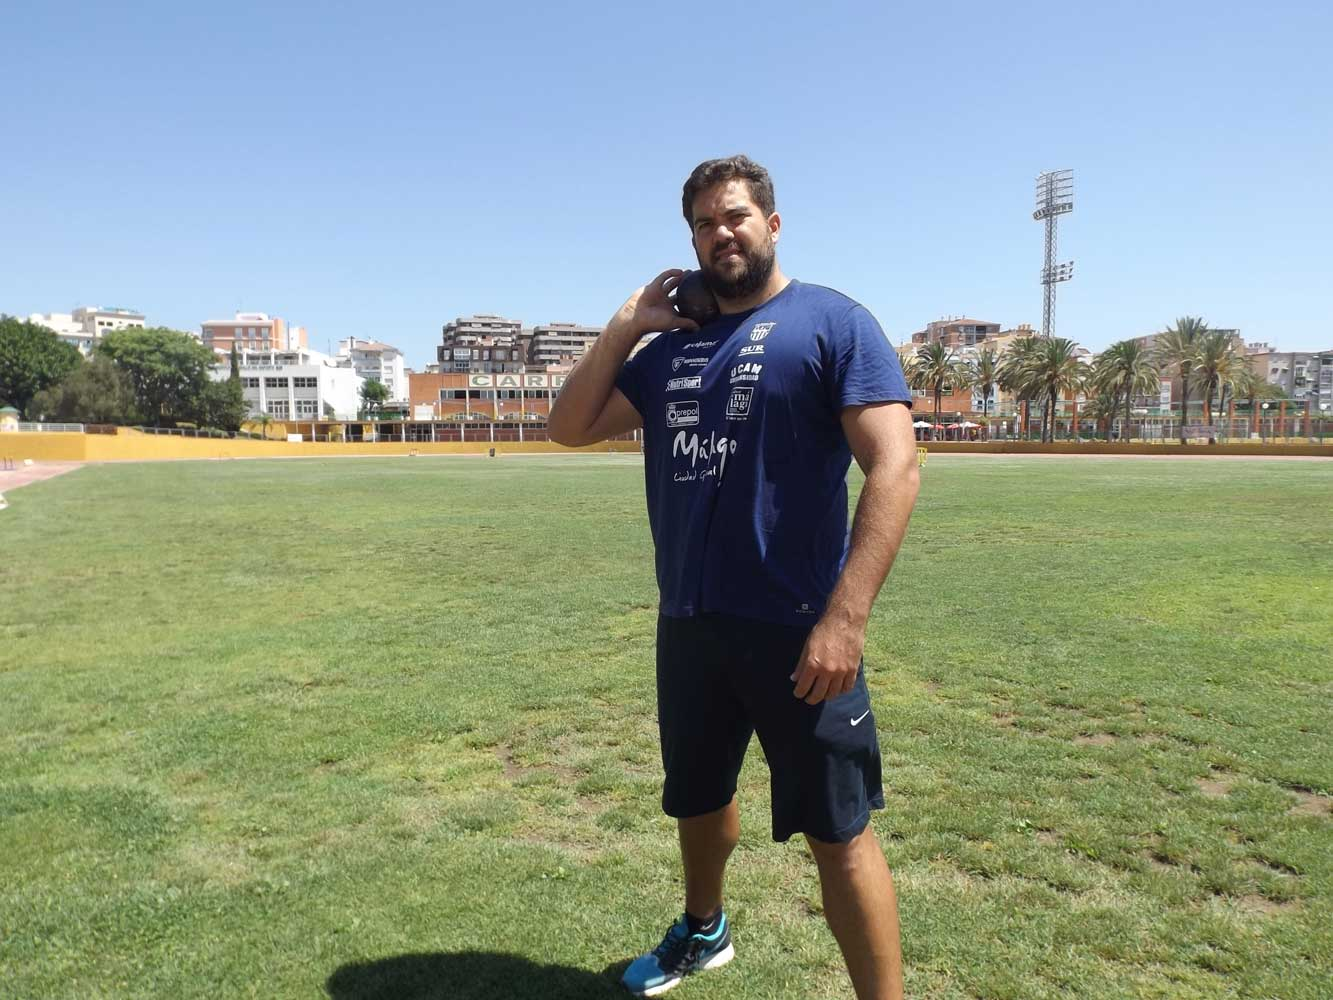 Borja Vivas simula un lanzamiento. JR/Avance Deportivo